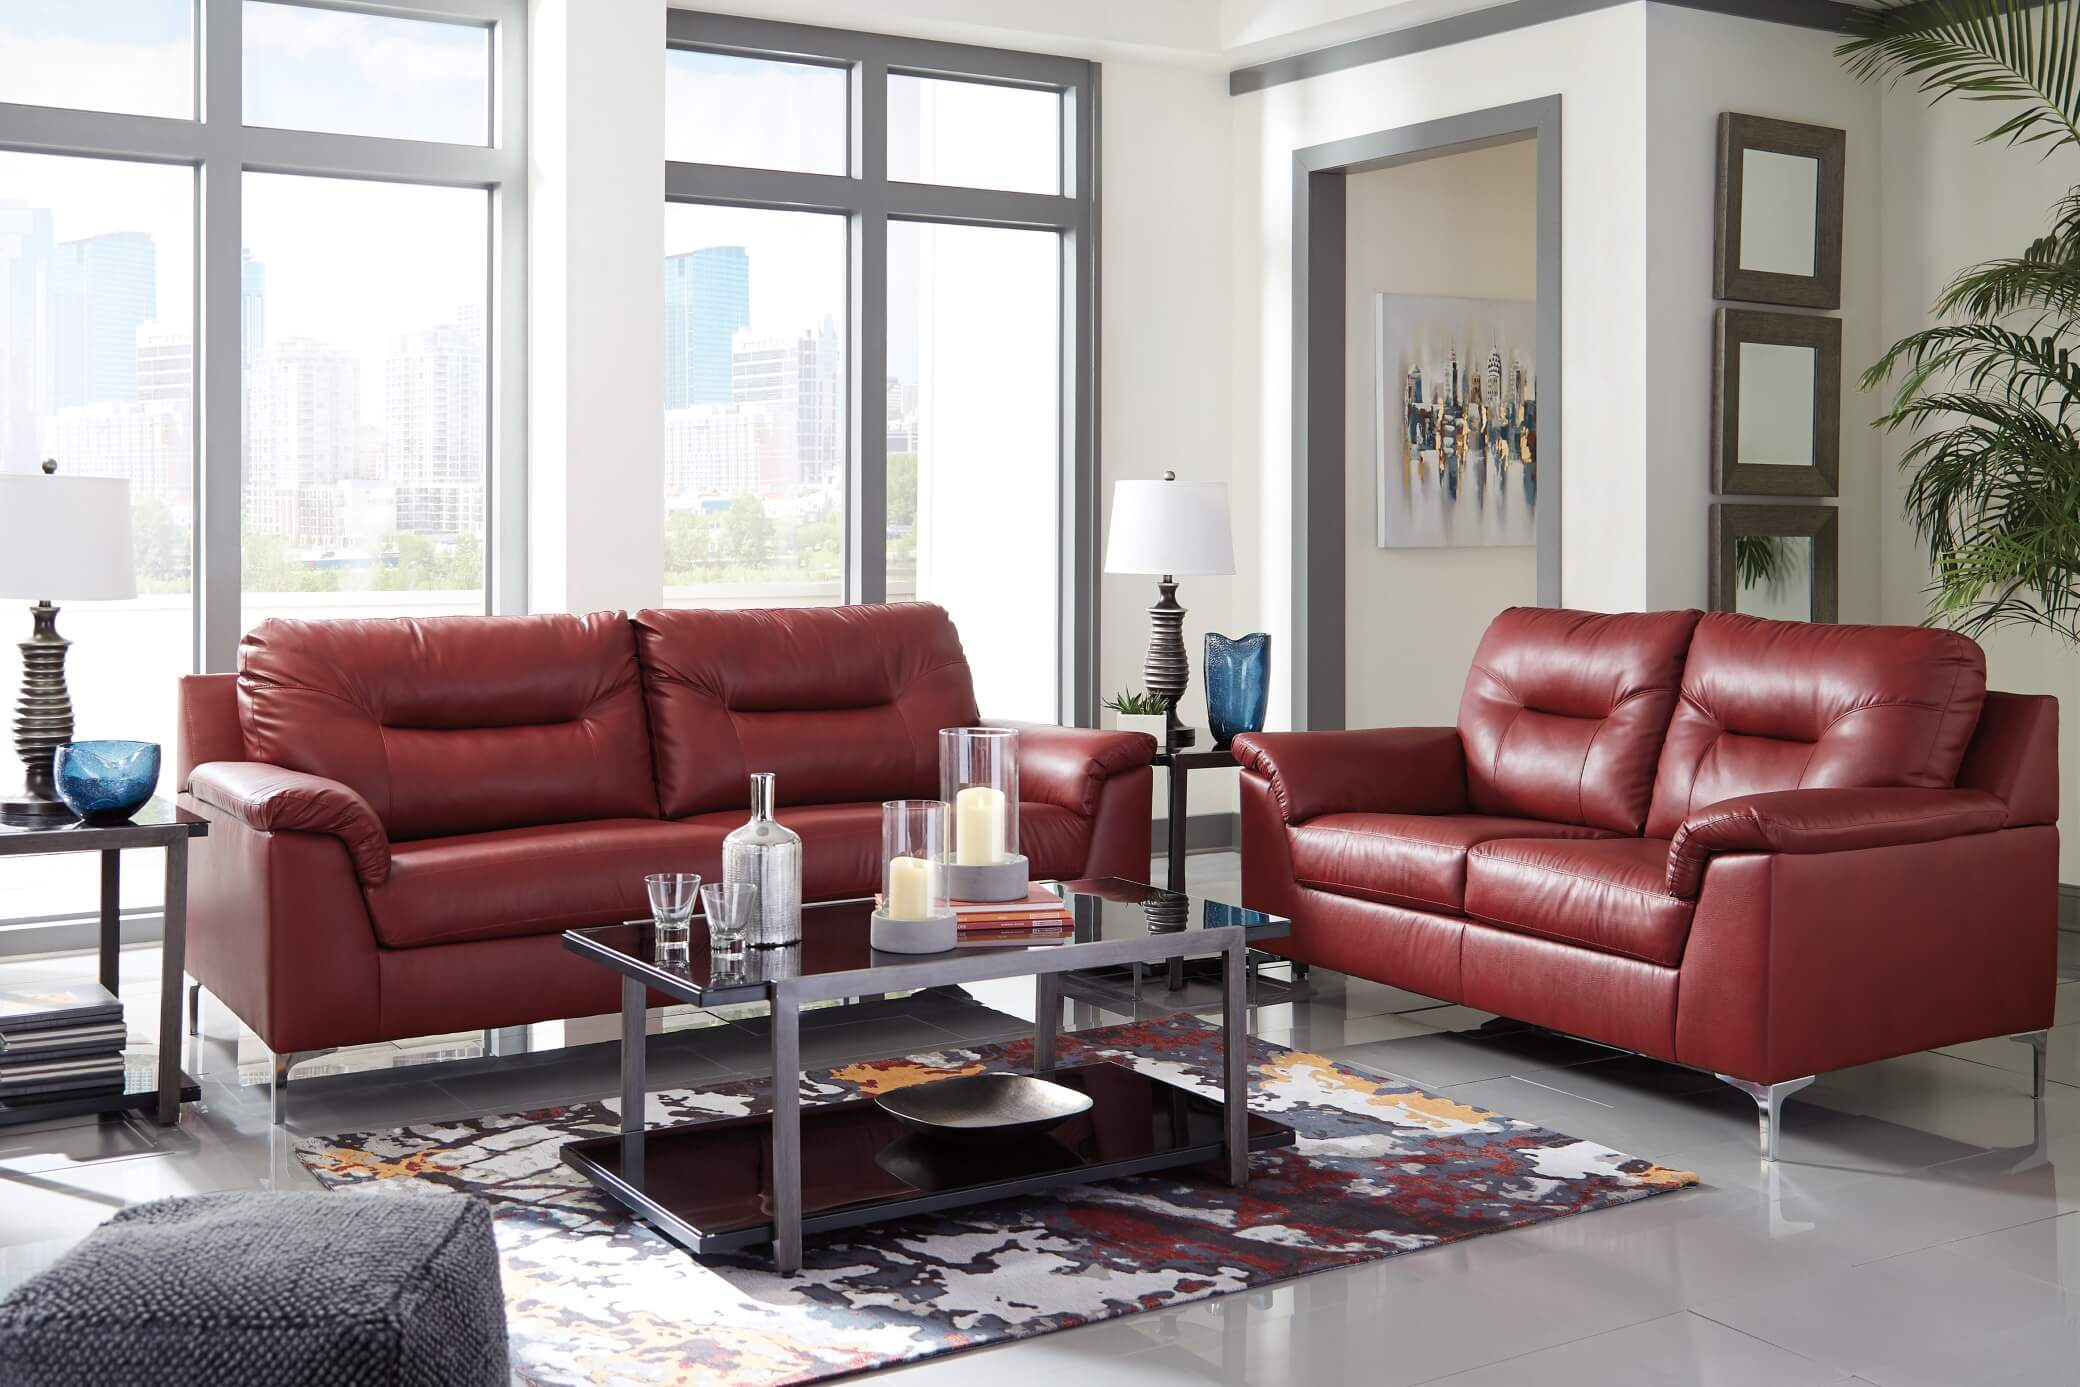 Tensas Crimson Contemporary Living Room Set | Urban Furniture Outlet